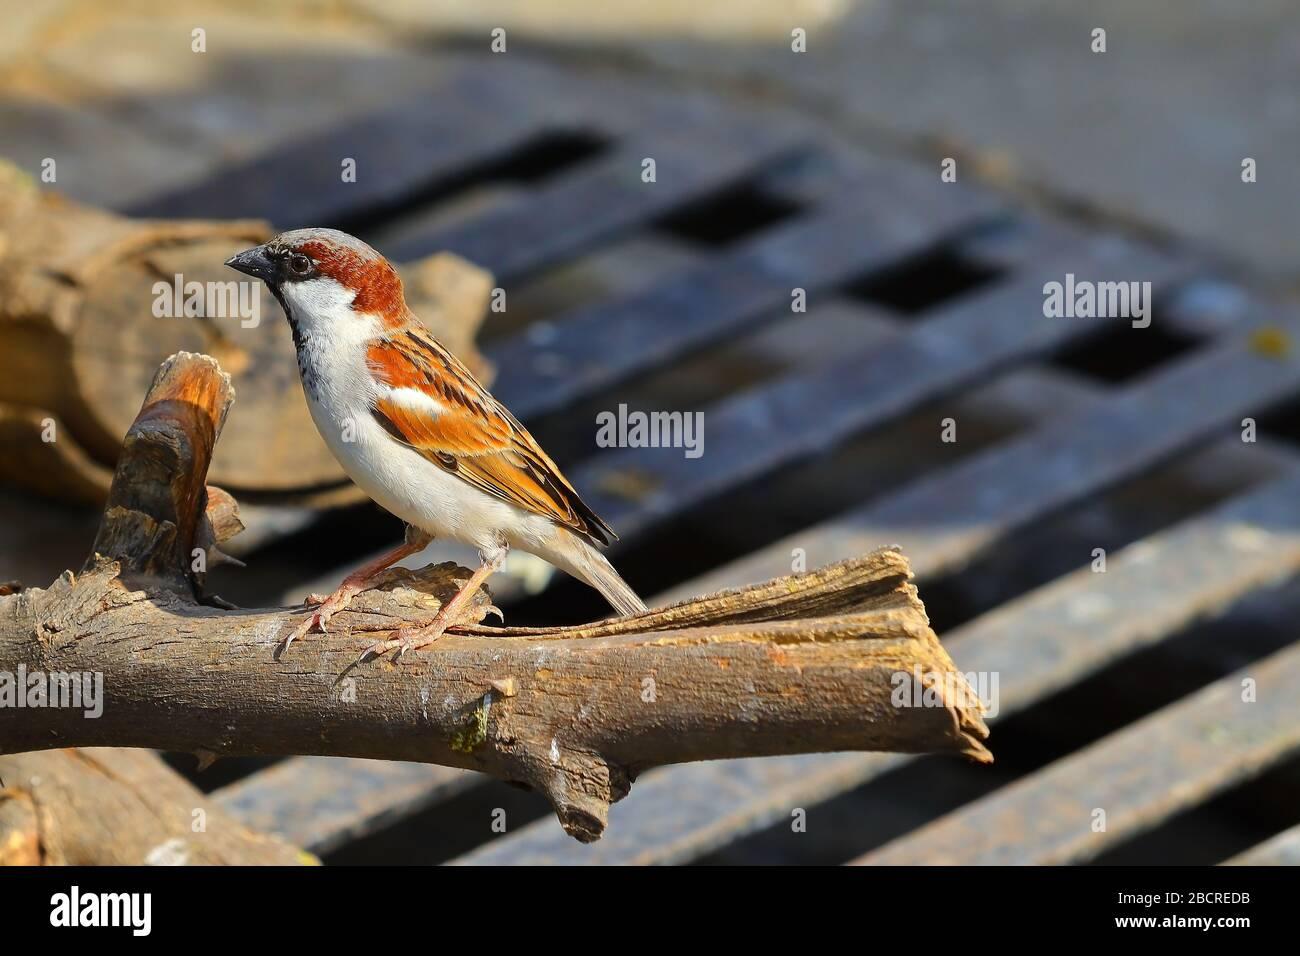 Aves domésticas de gorrión perching en madera seca Foto de stock